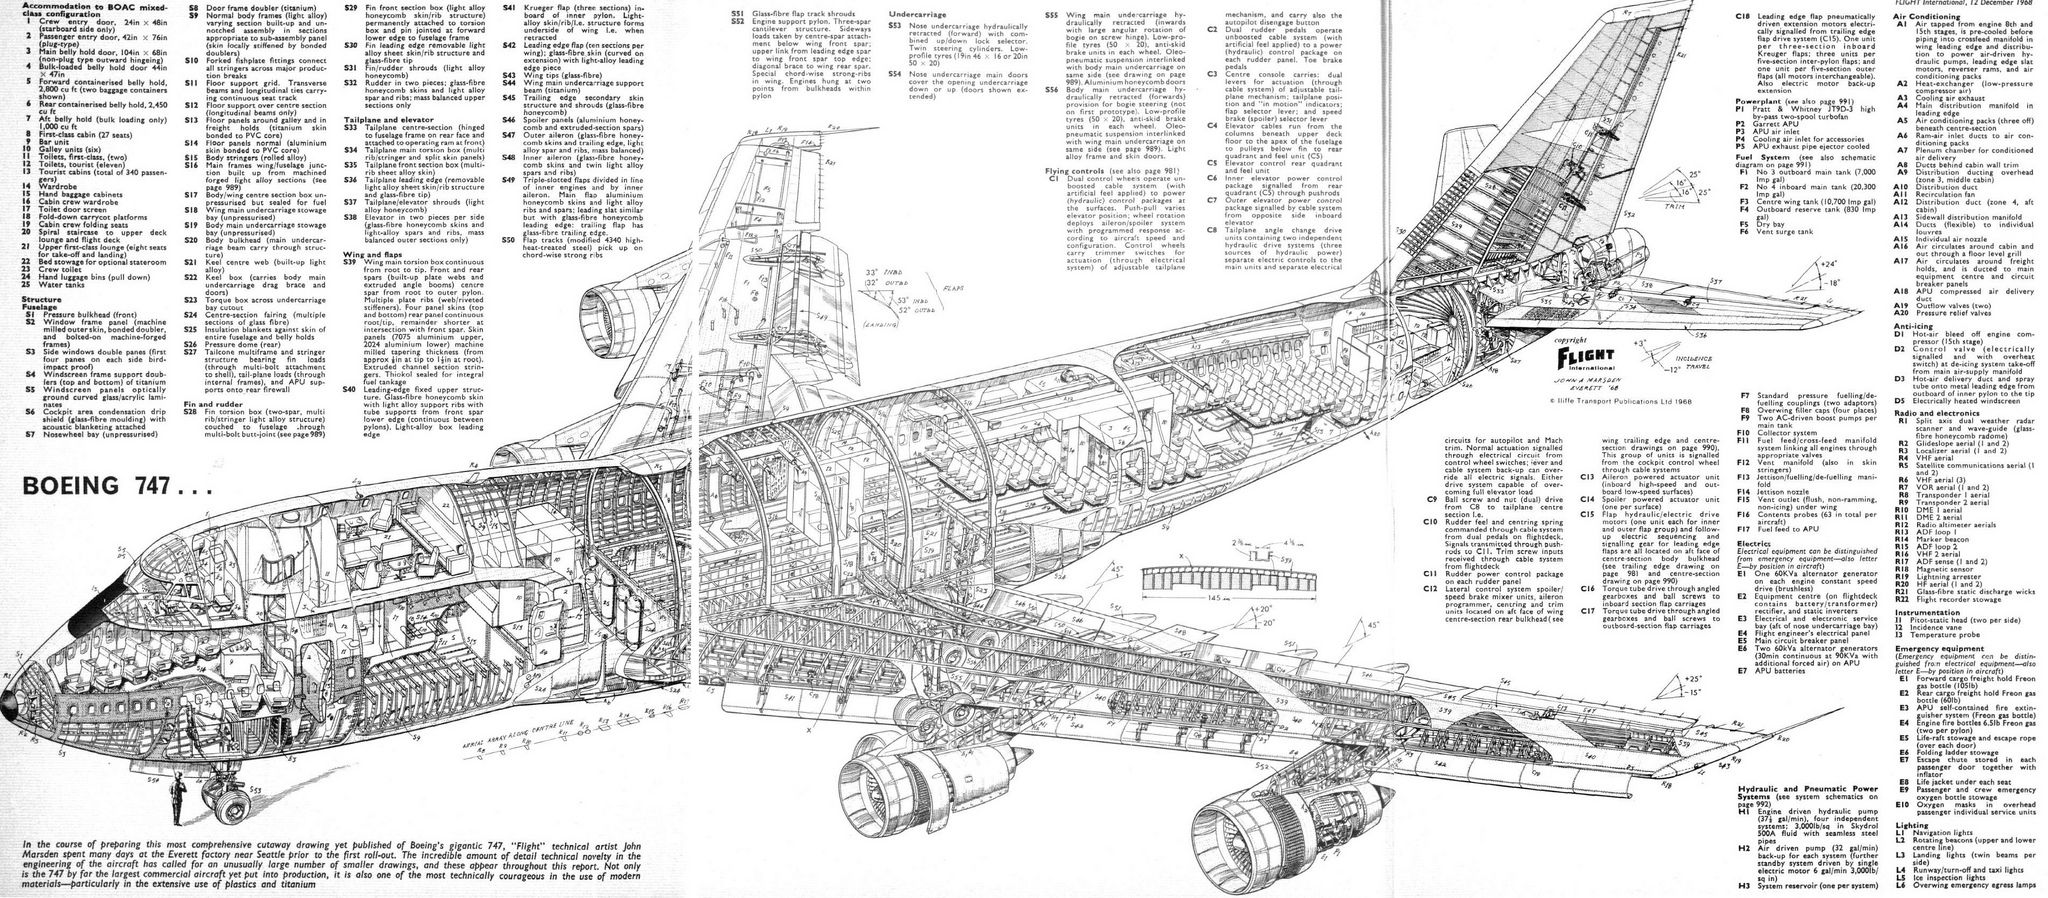 747 In Cutaway | Aerospace cutaways and diagrams | Pinterest ...